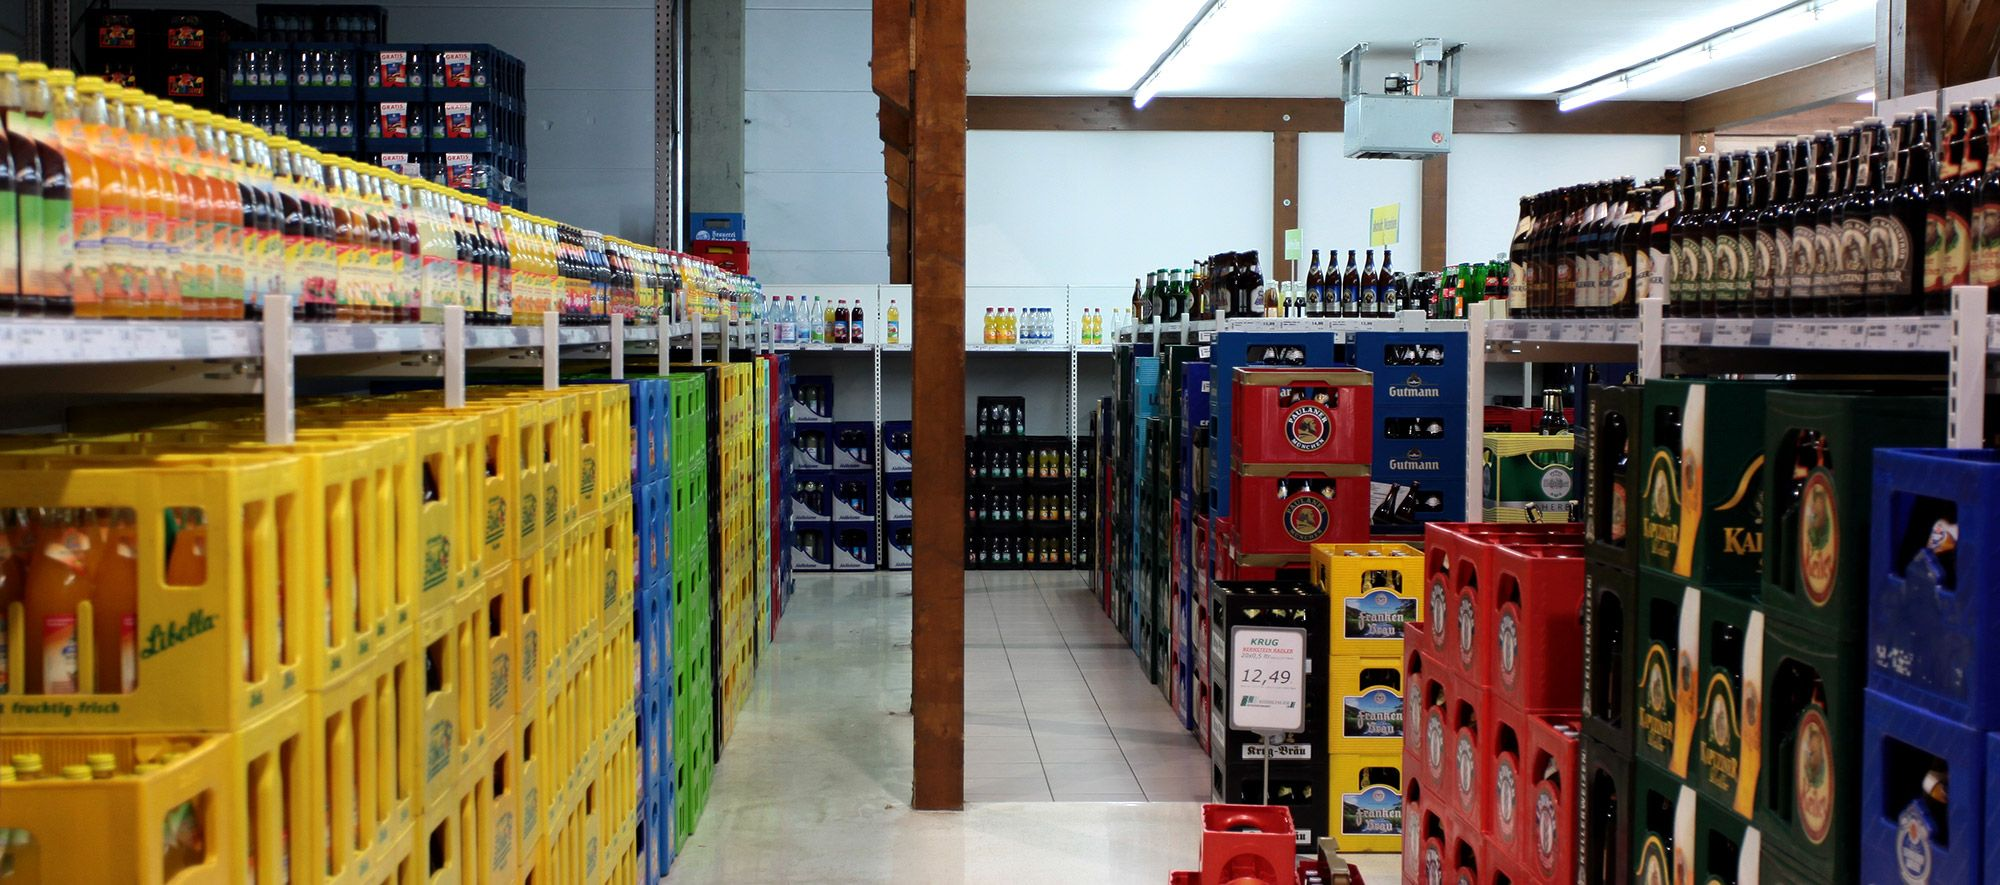 Aktuelle Werbung | Getränke Kiesslinger